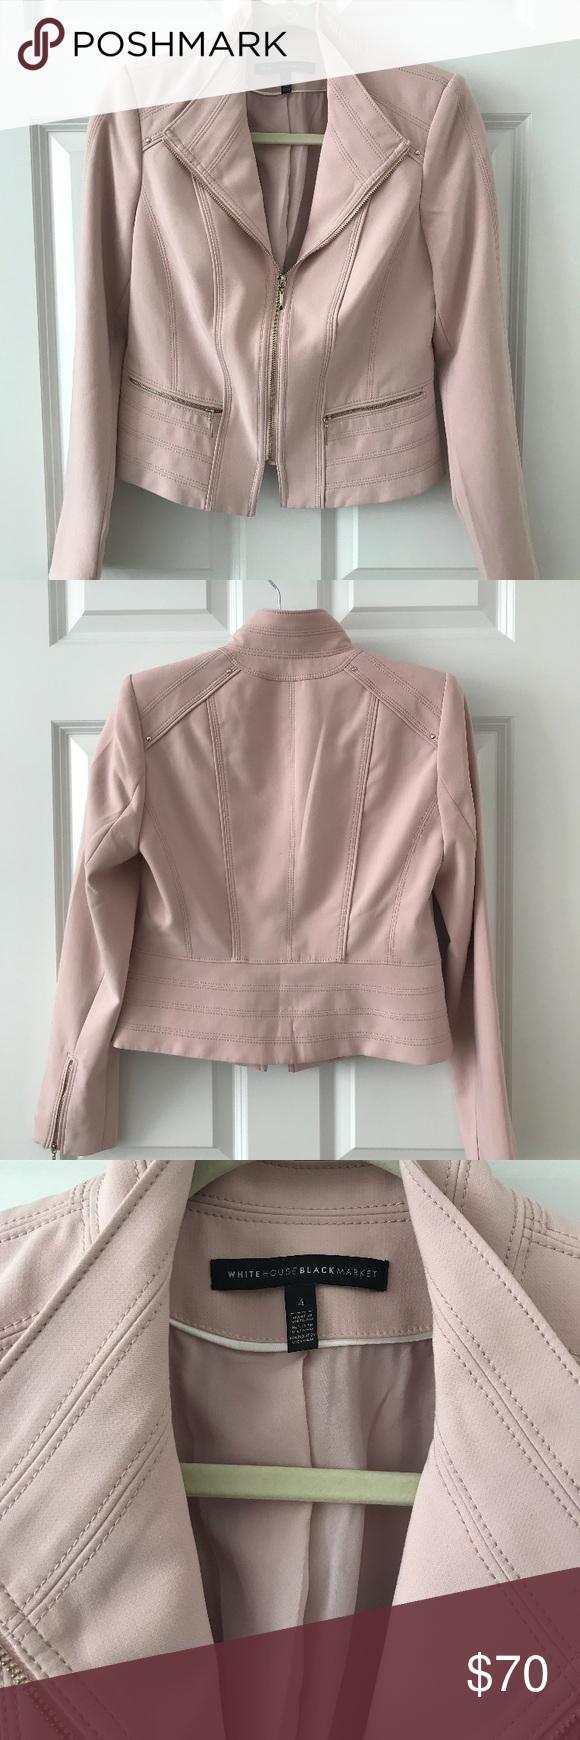 White House Black Market fitted jacket Worn once, like new condition! White House Black Market Jackets & Coats